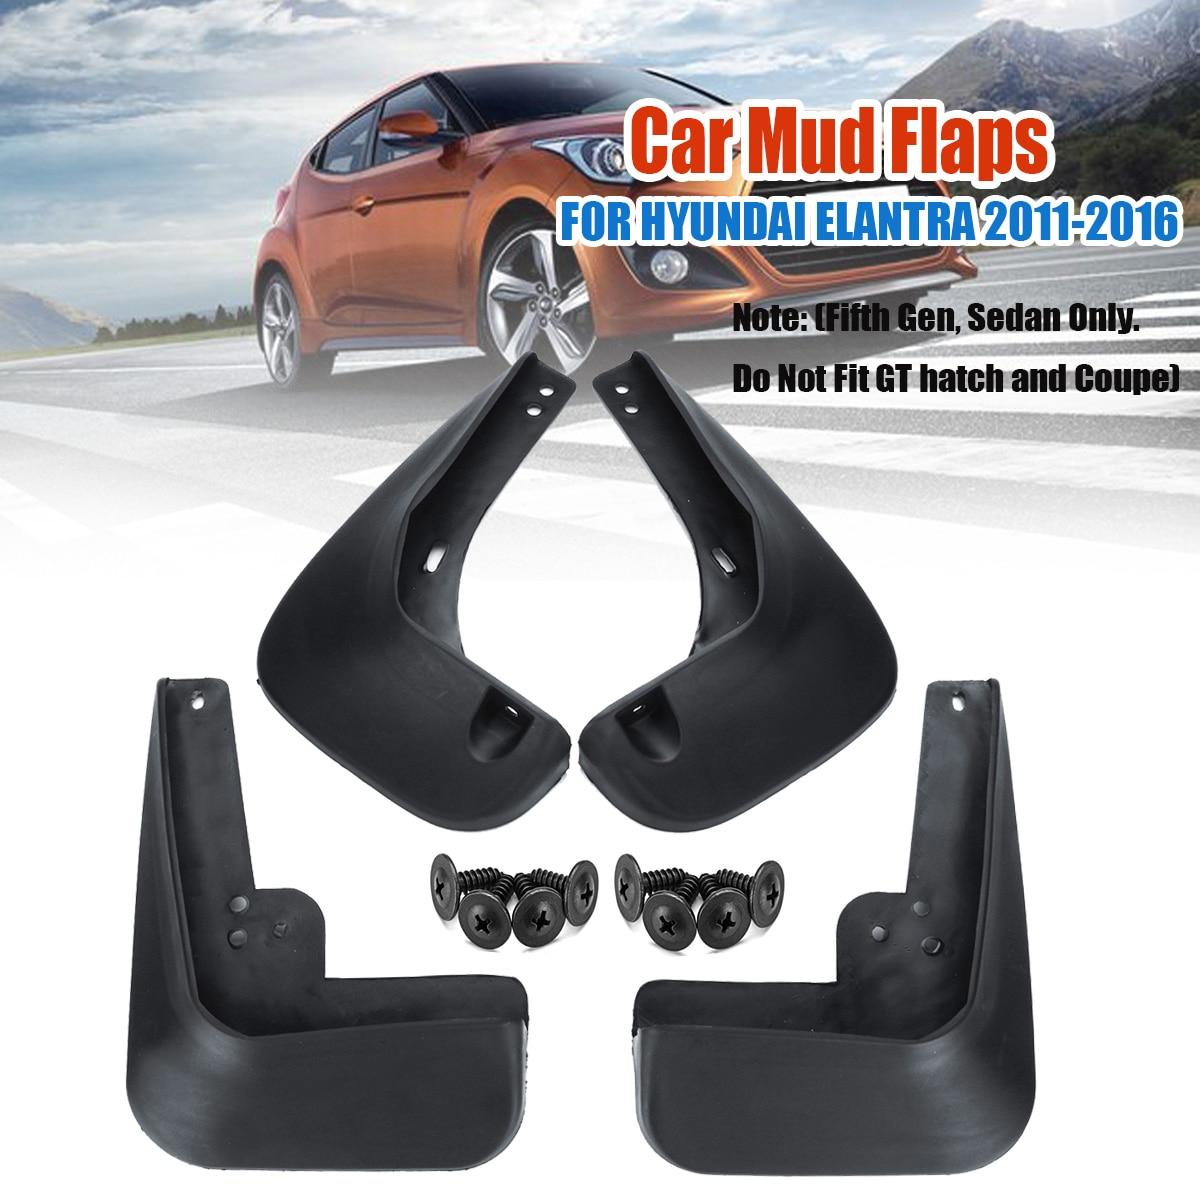 4 pz Accessori Per Auto Mud Flaps Parafanghi per HYUNDAI ELANTRA 2011 2012 2013 2014 2015 2016 Mudflap Parafanghi Splash guardia